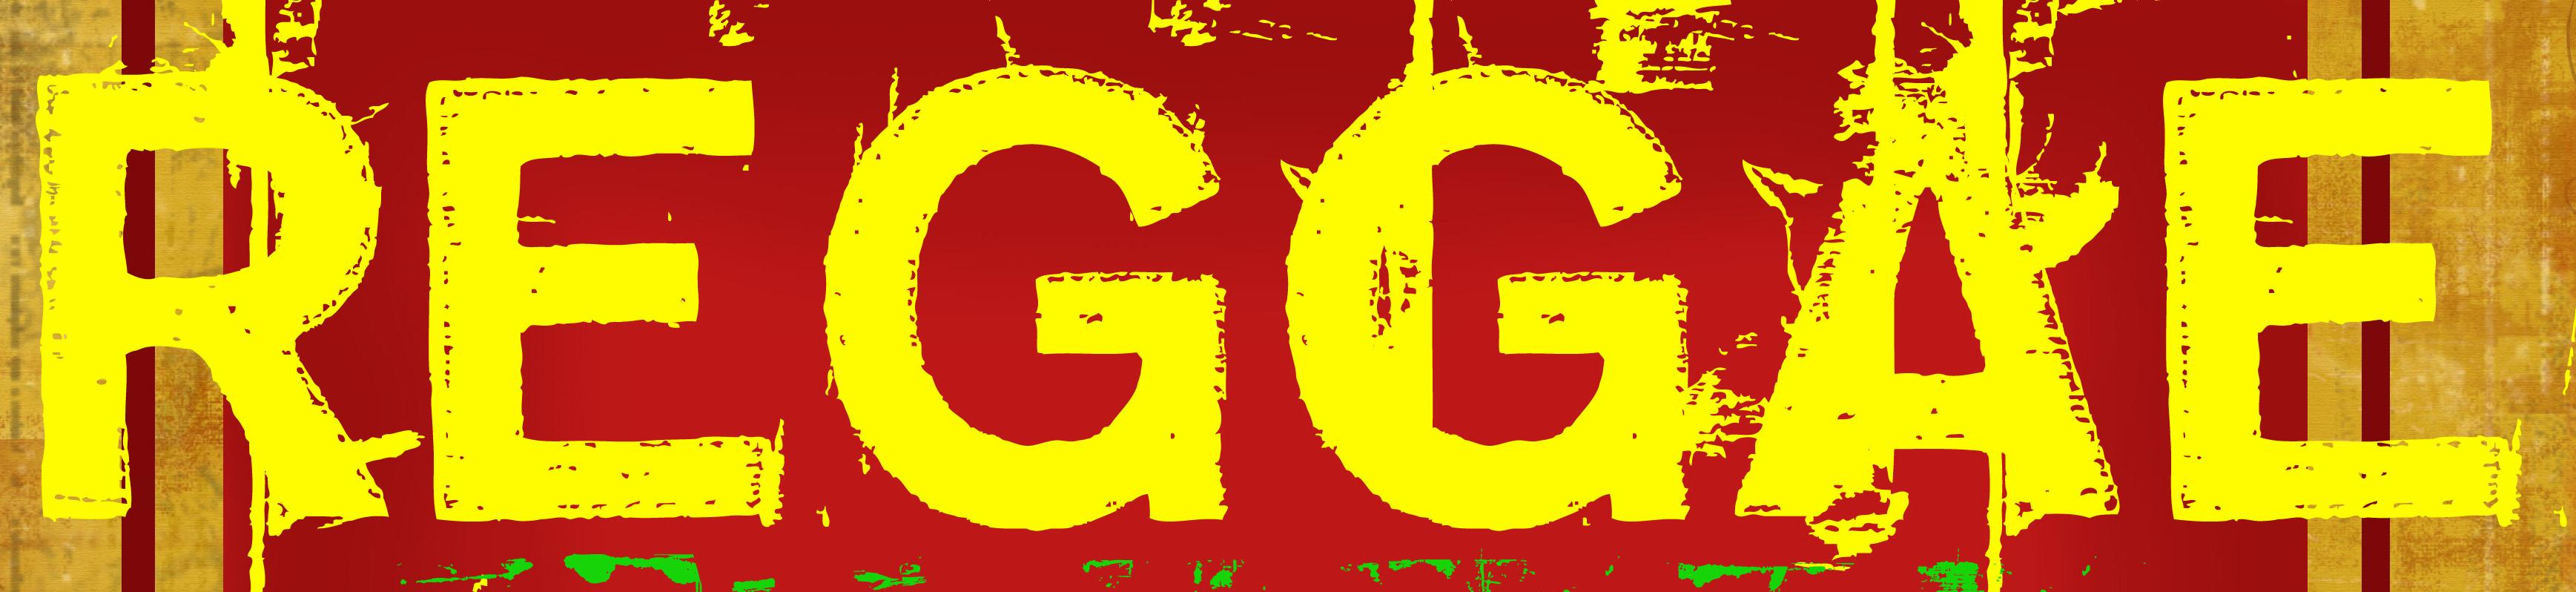 Jamaican Reggae Banner